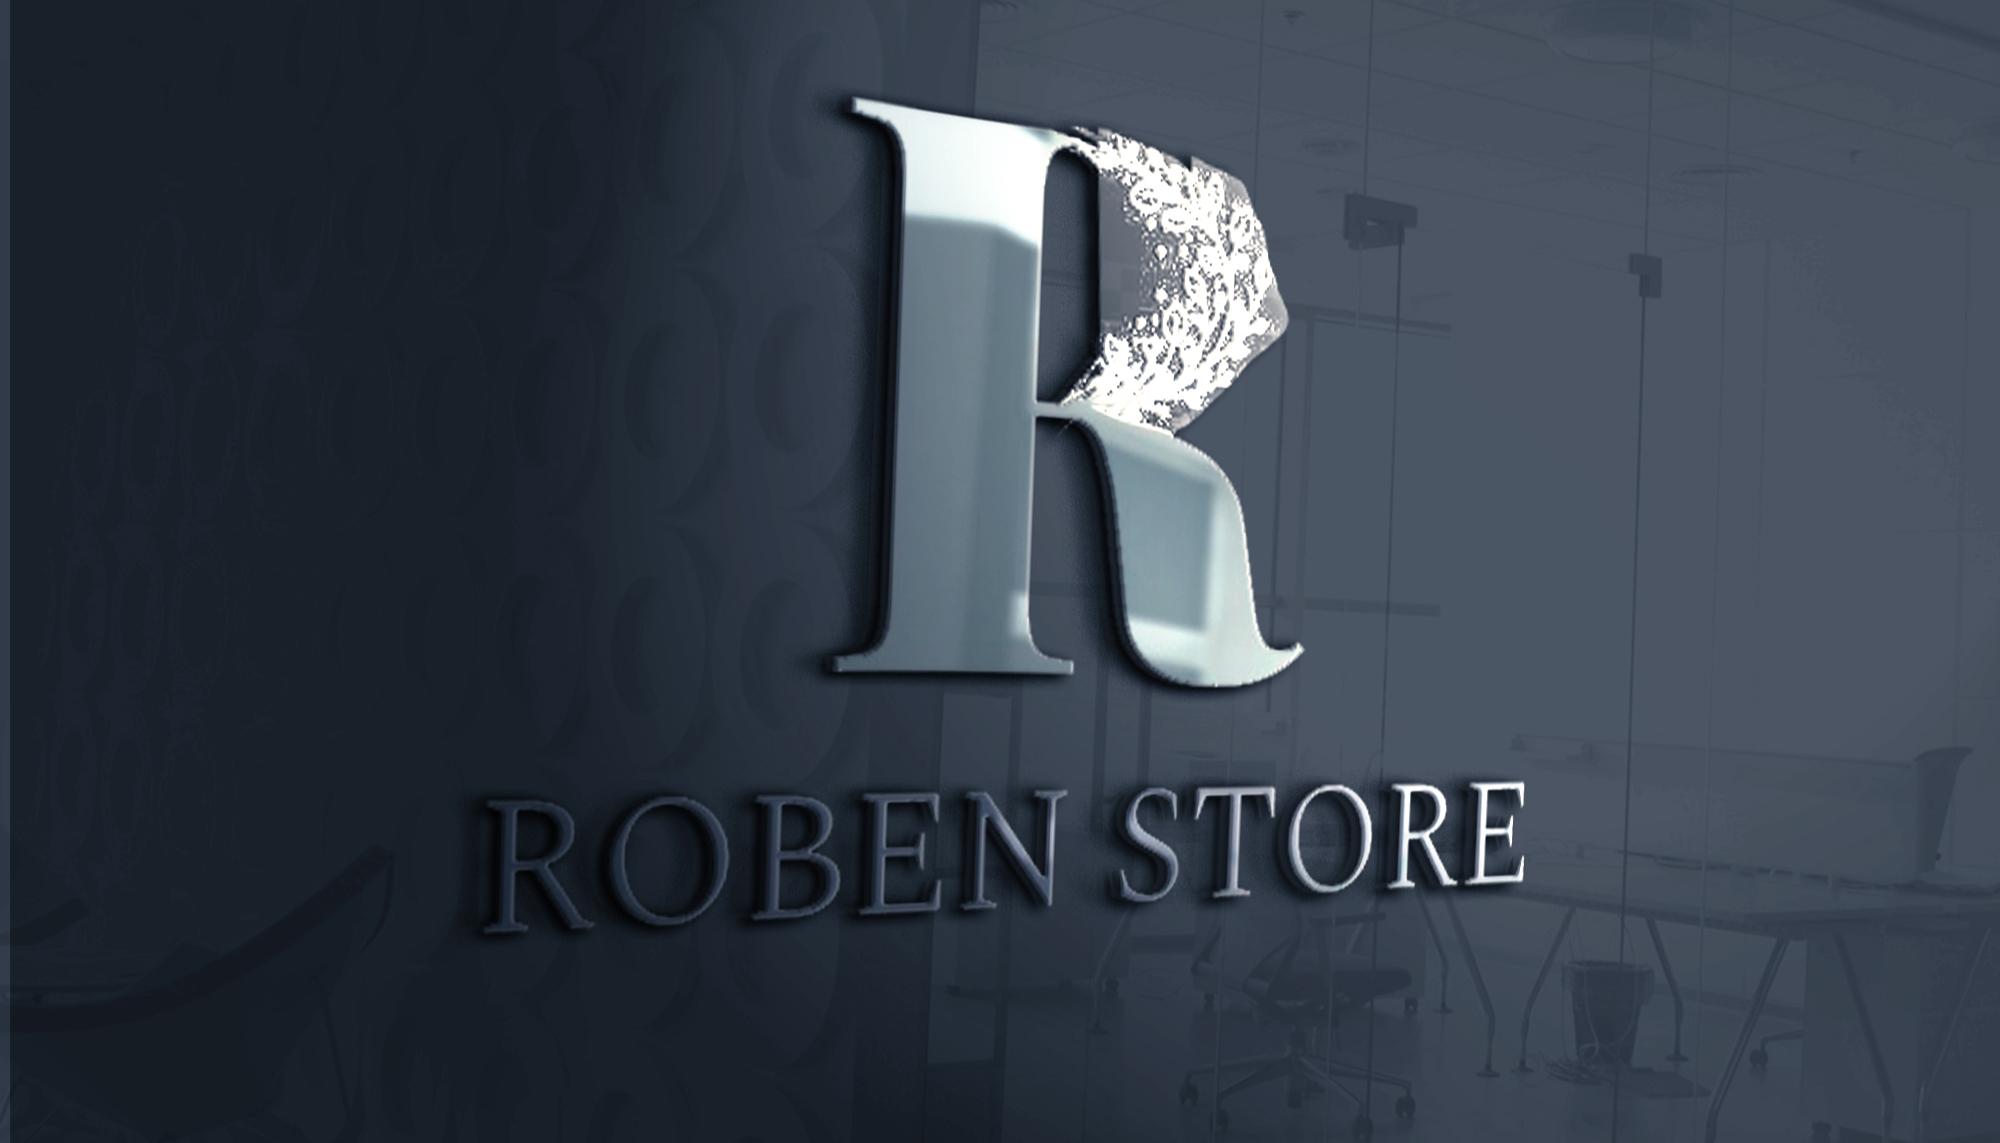 متجر روبن